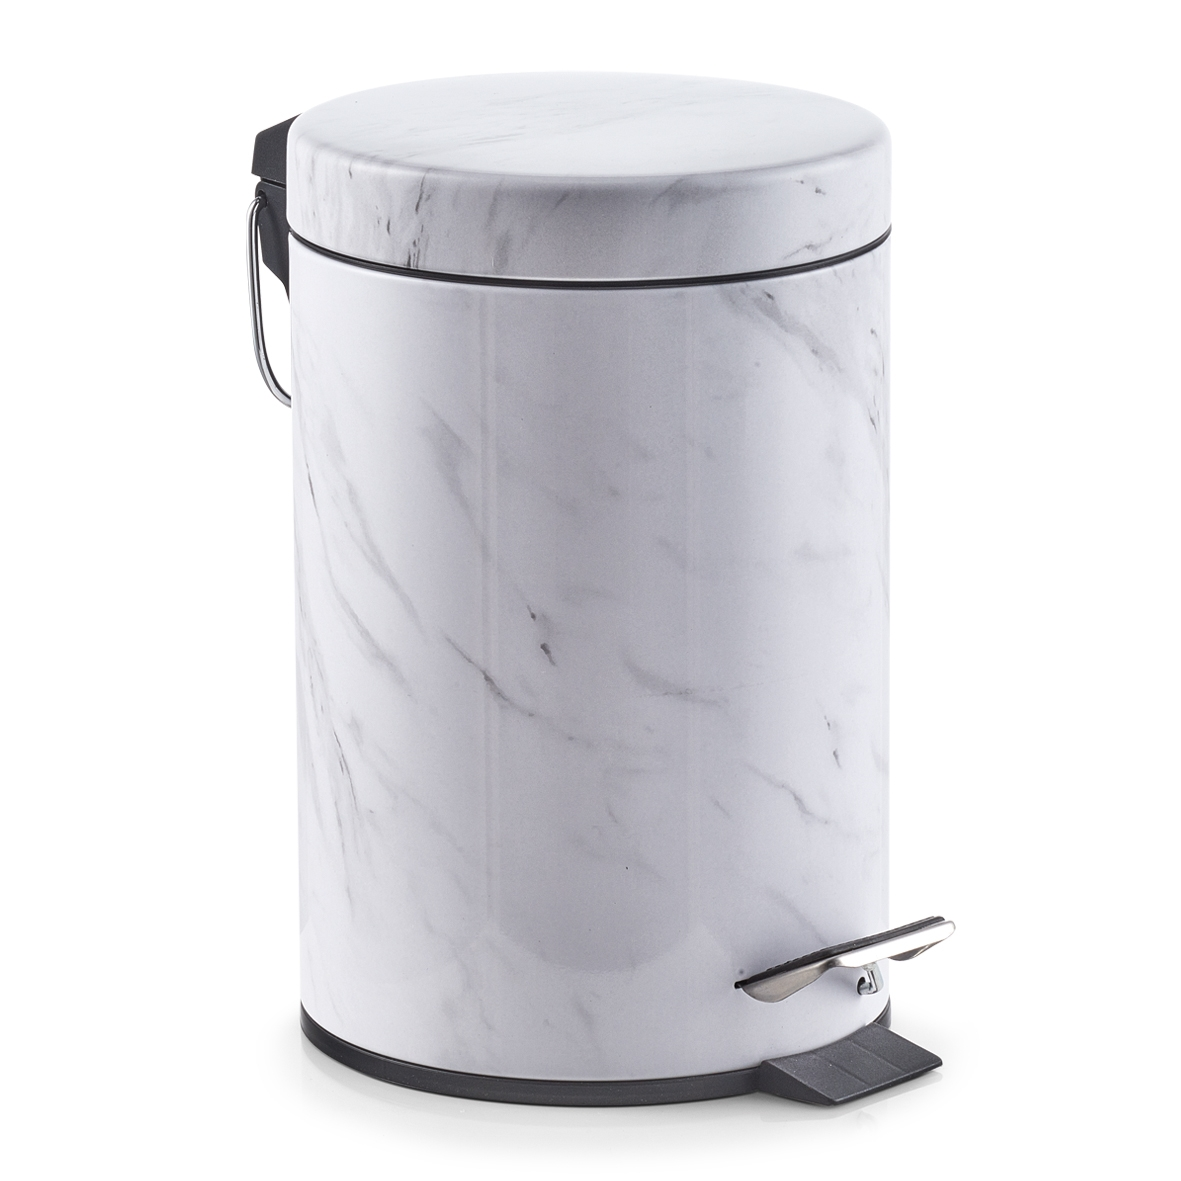 Cos de gunoi cu pedala pentru baie, Marble White, 3L imagine